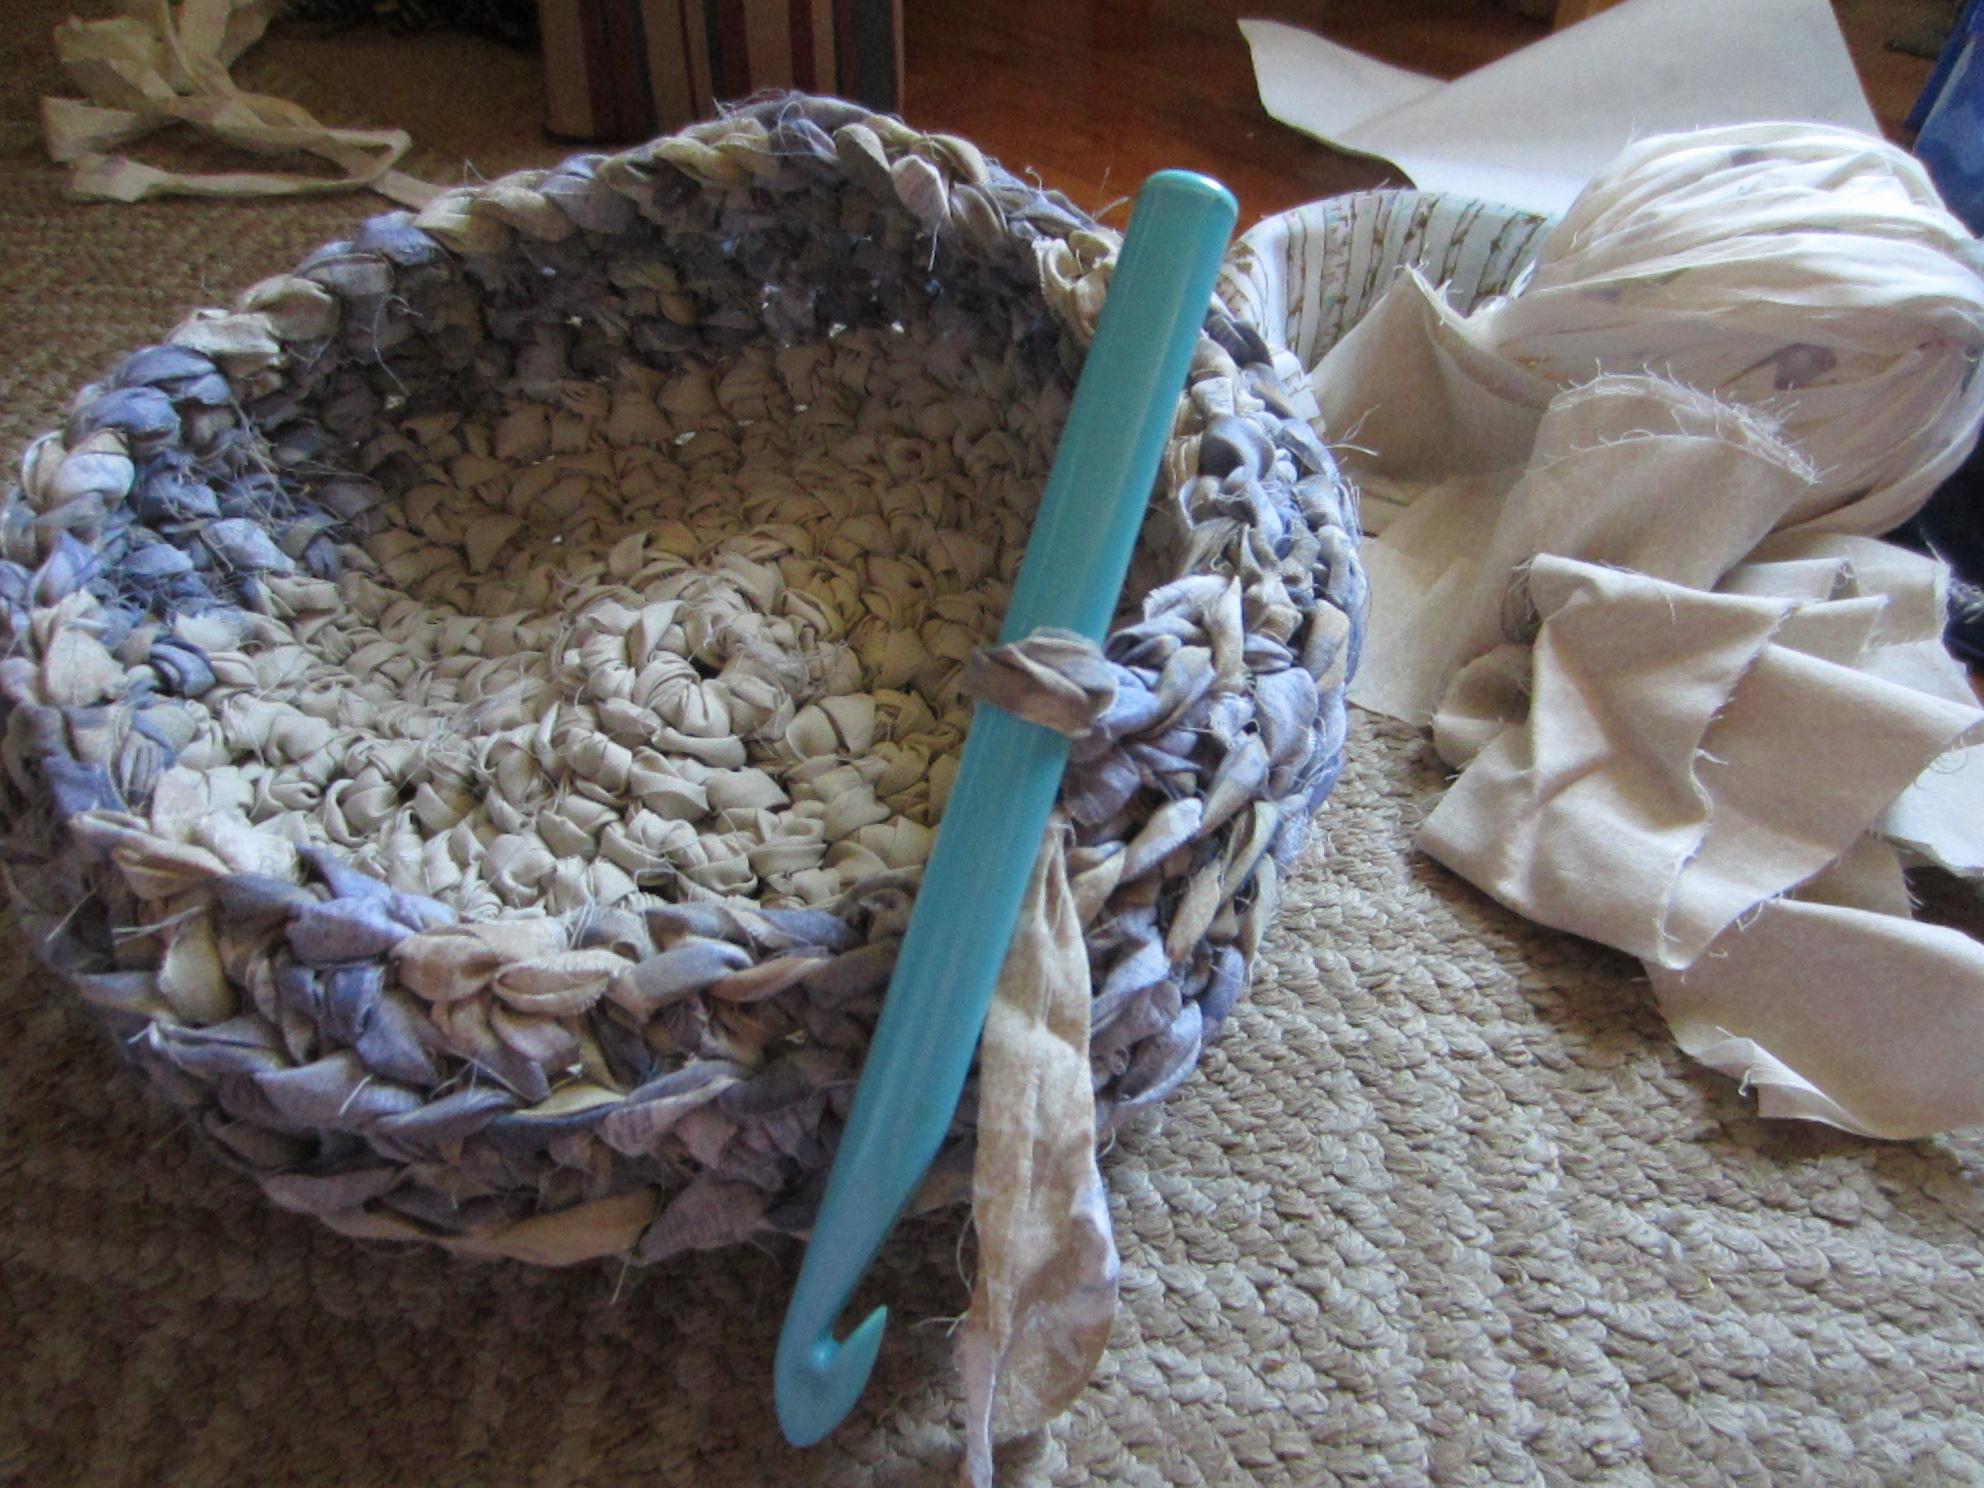 A Tisket A Tasket A New Crochet Rag Basket G Ma